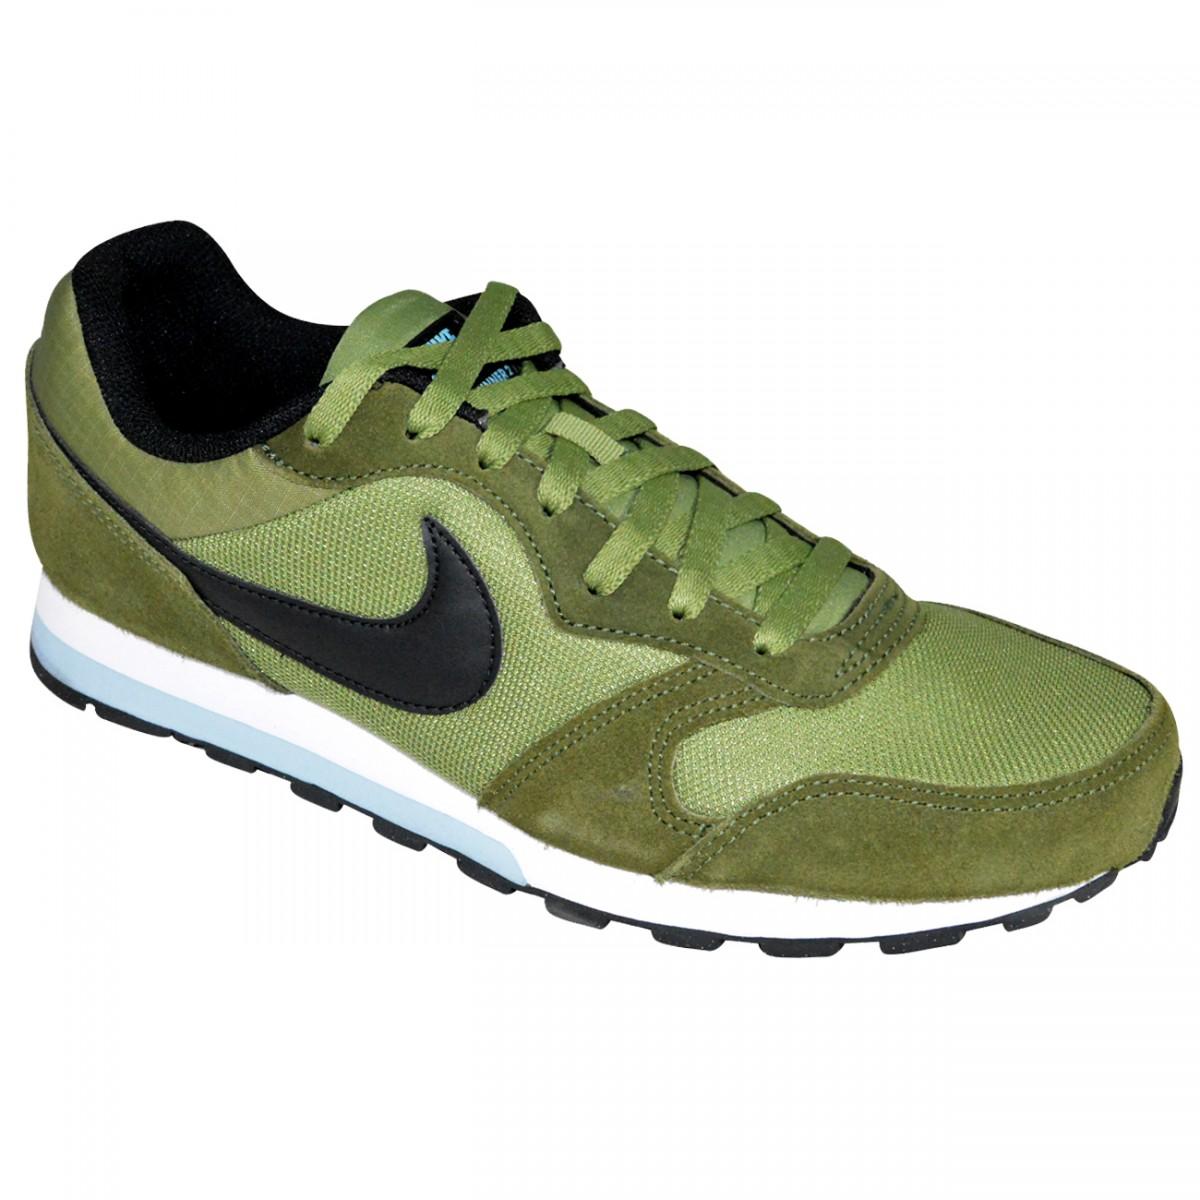 2eda9bb4b8 Tenis Nike MD Runner 2 749794 300 - Verde Militar Preto - Chuteira Nike